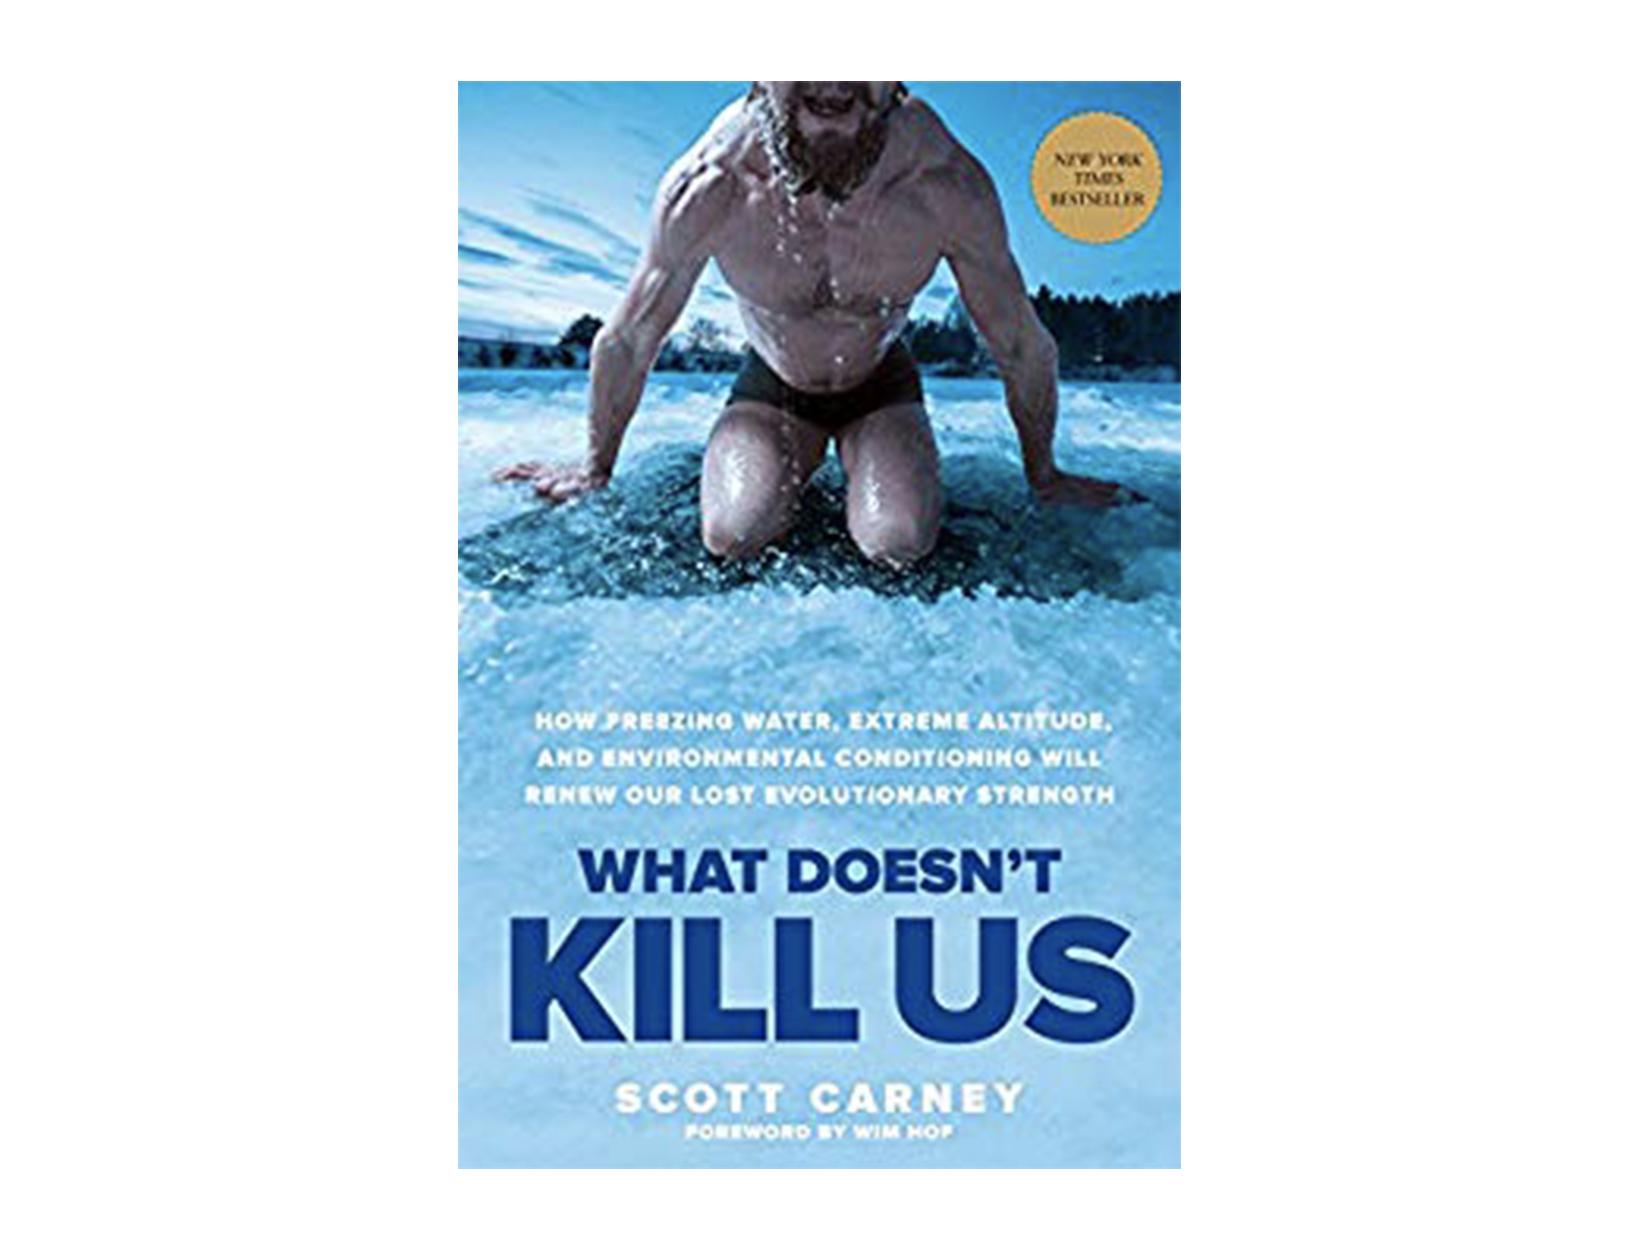 <em>What Doesn't Kill Us</em> by Scott Carney